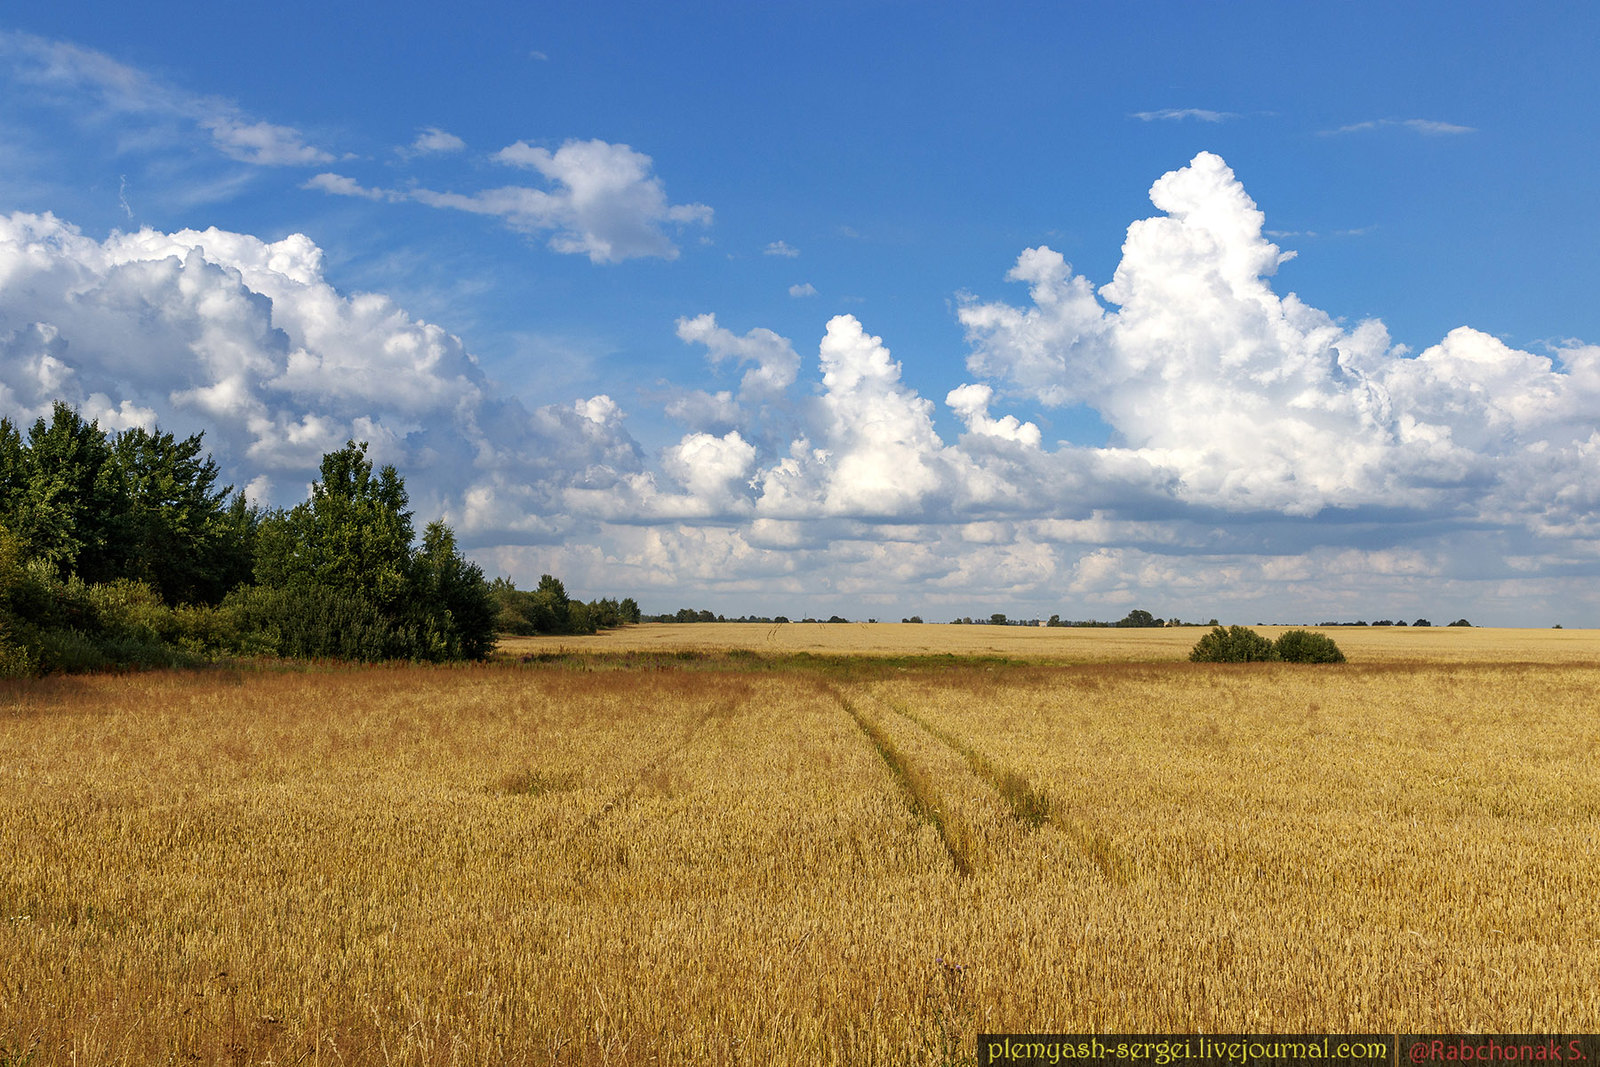 Soon a new crop